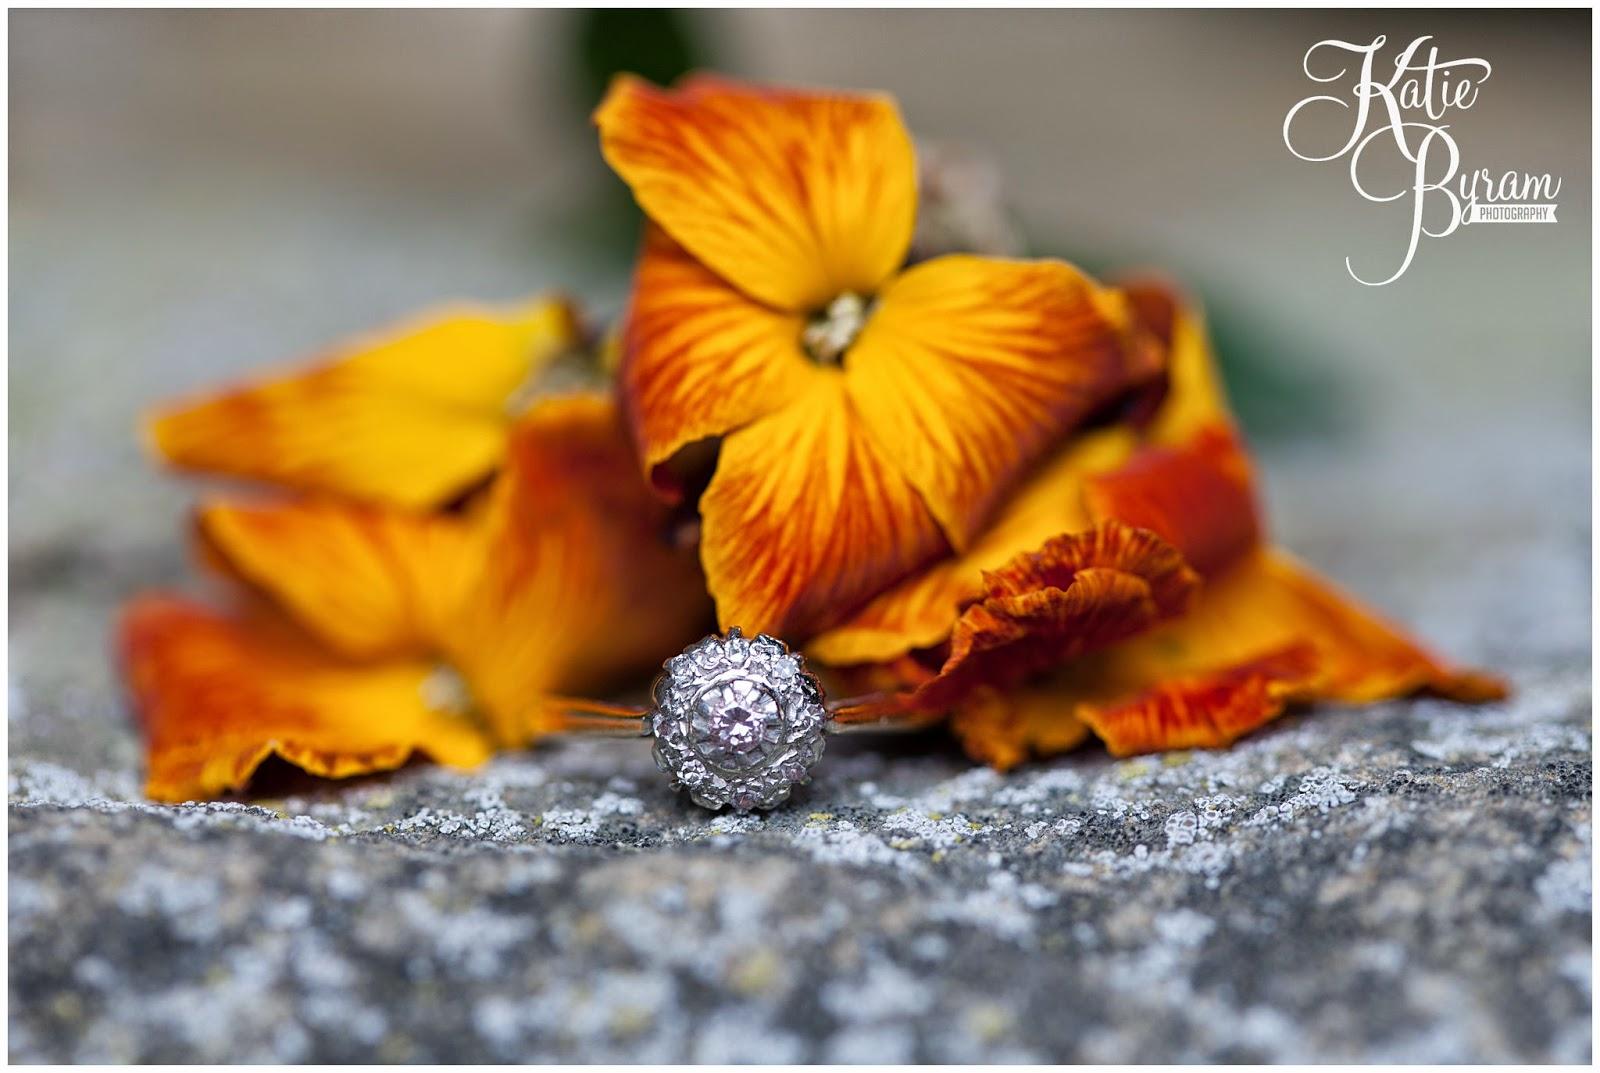 engagement ring, danby castle wedding, danby castle pre-wedding shoot, danby north yorkshire, quirky wedding venue yorkshire, wedding venue yorkshire, katie byram photography, countryside wedding venue, danby castle